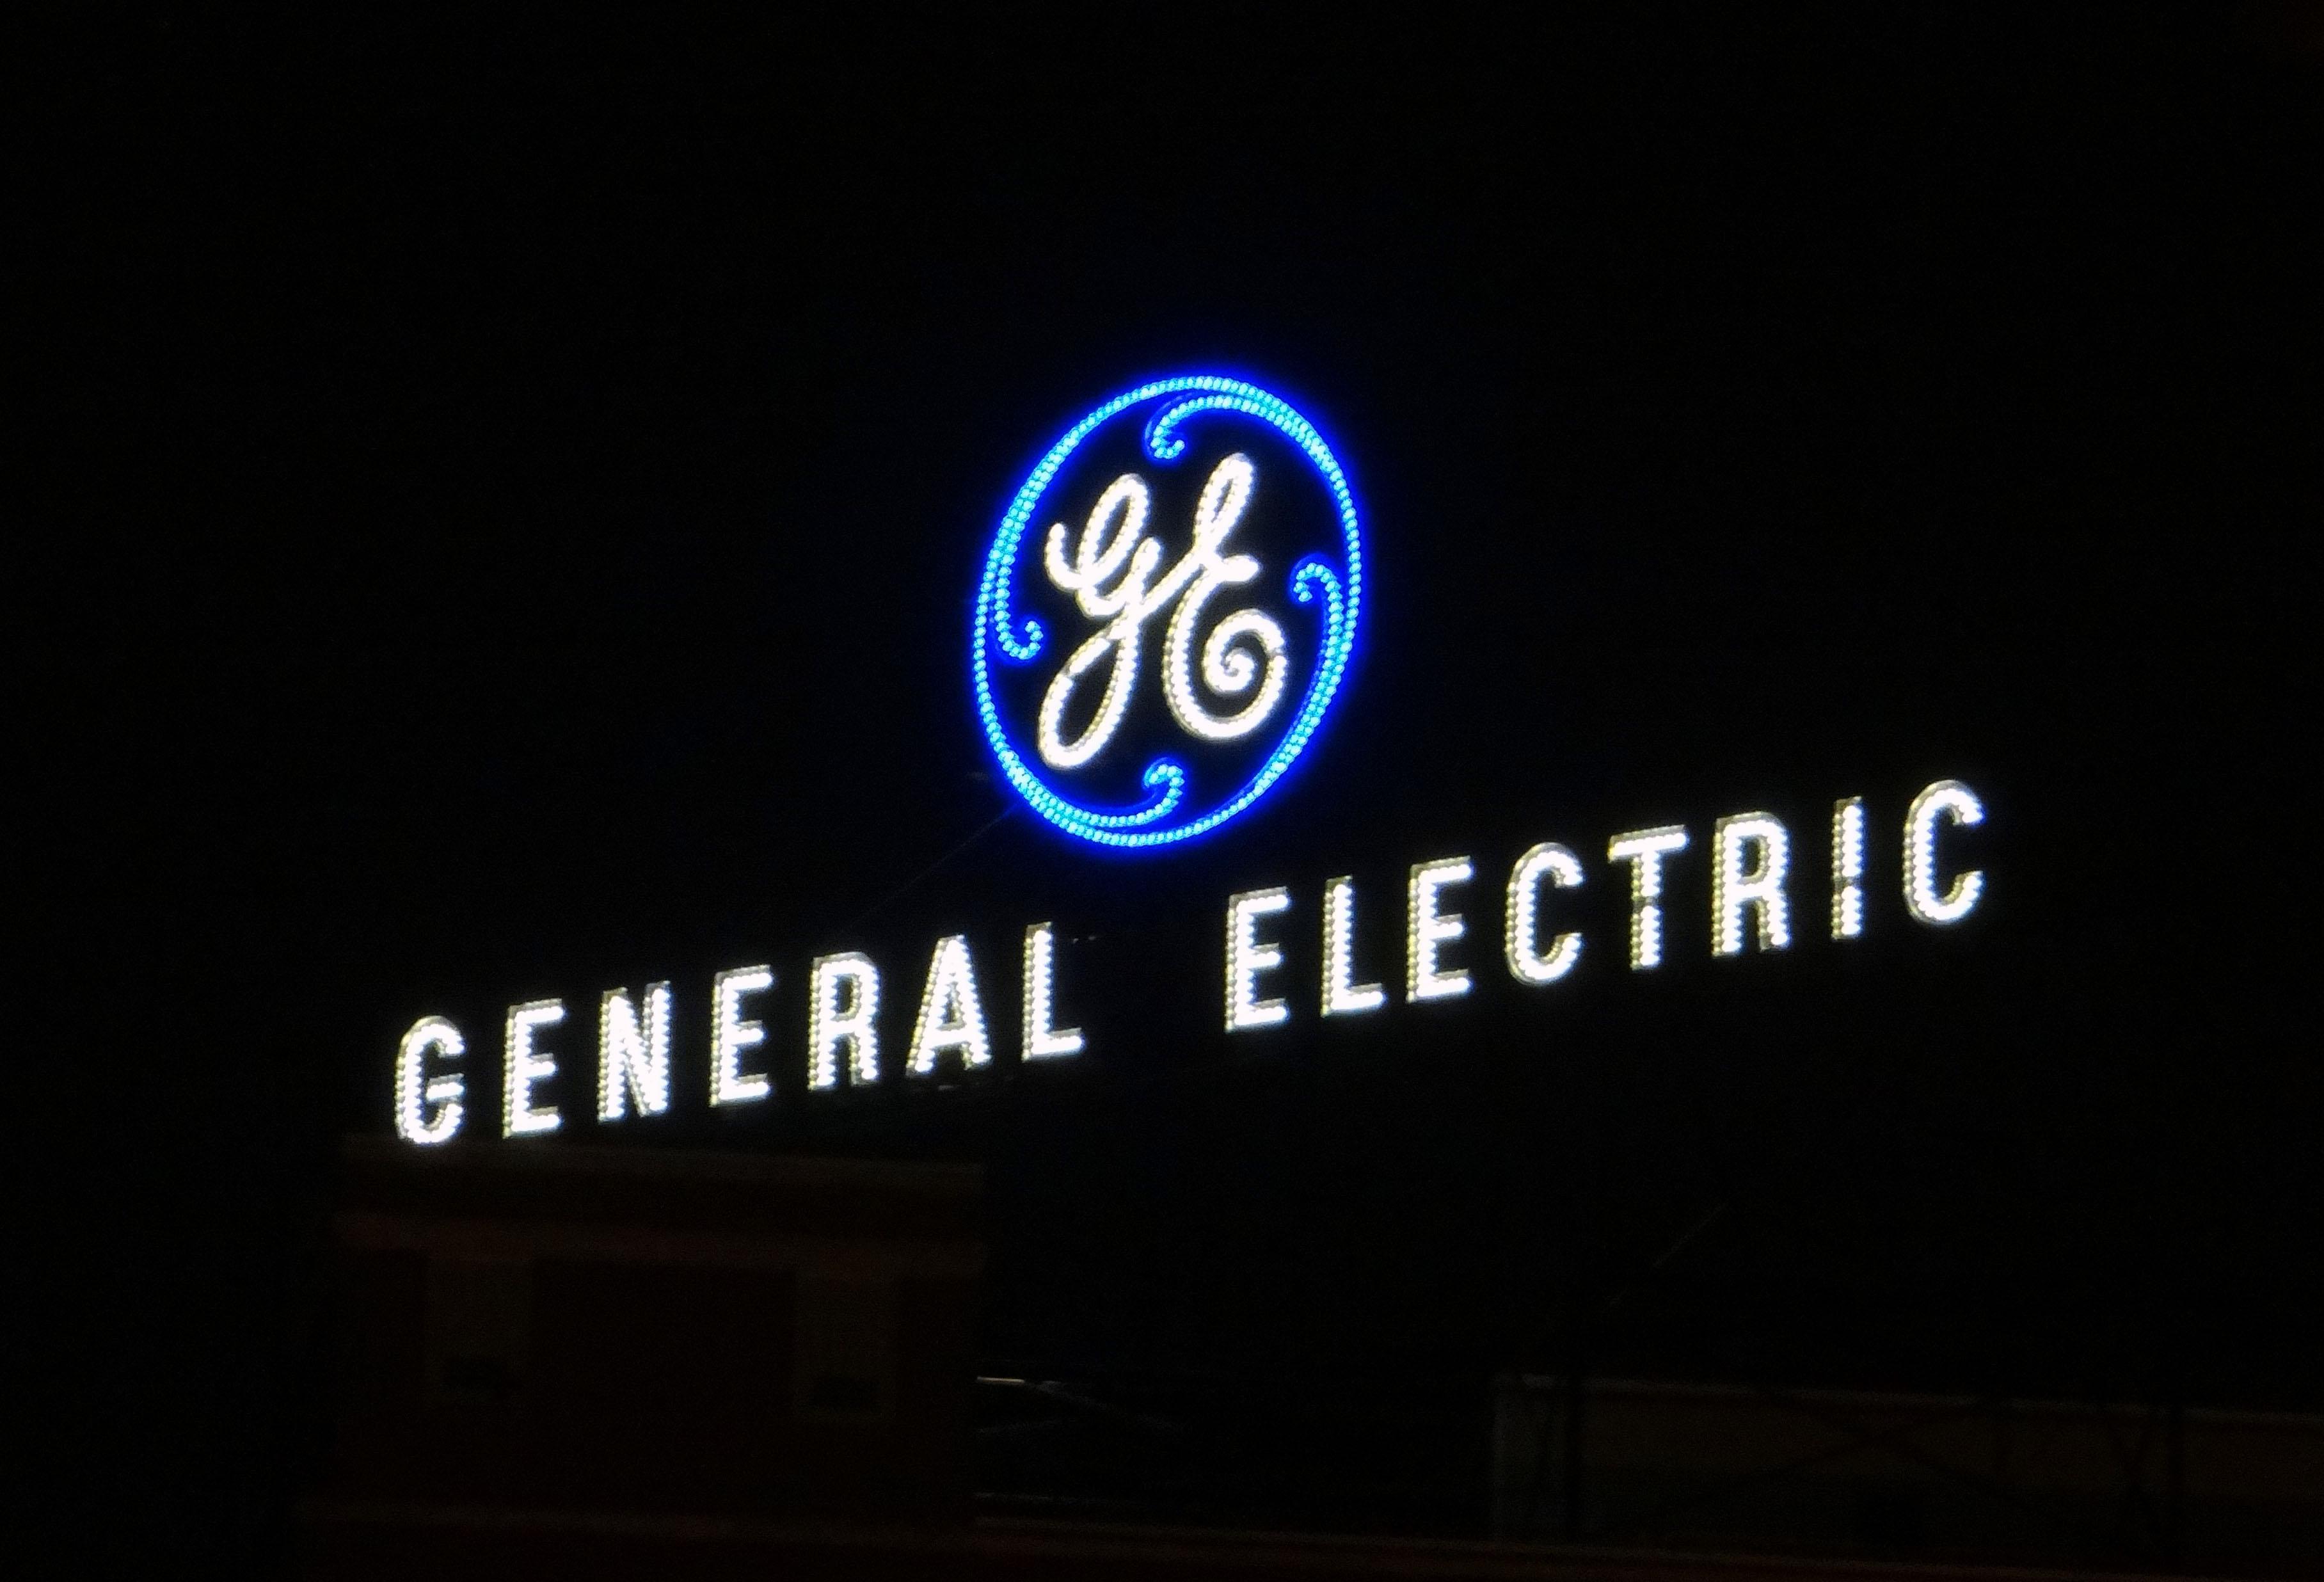 general electric 2004: